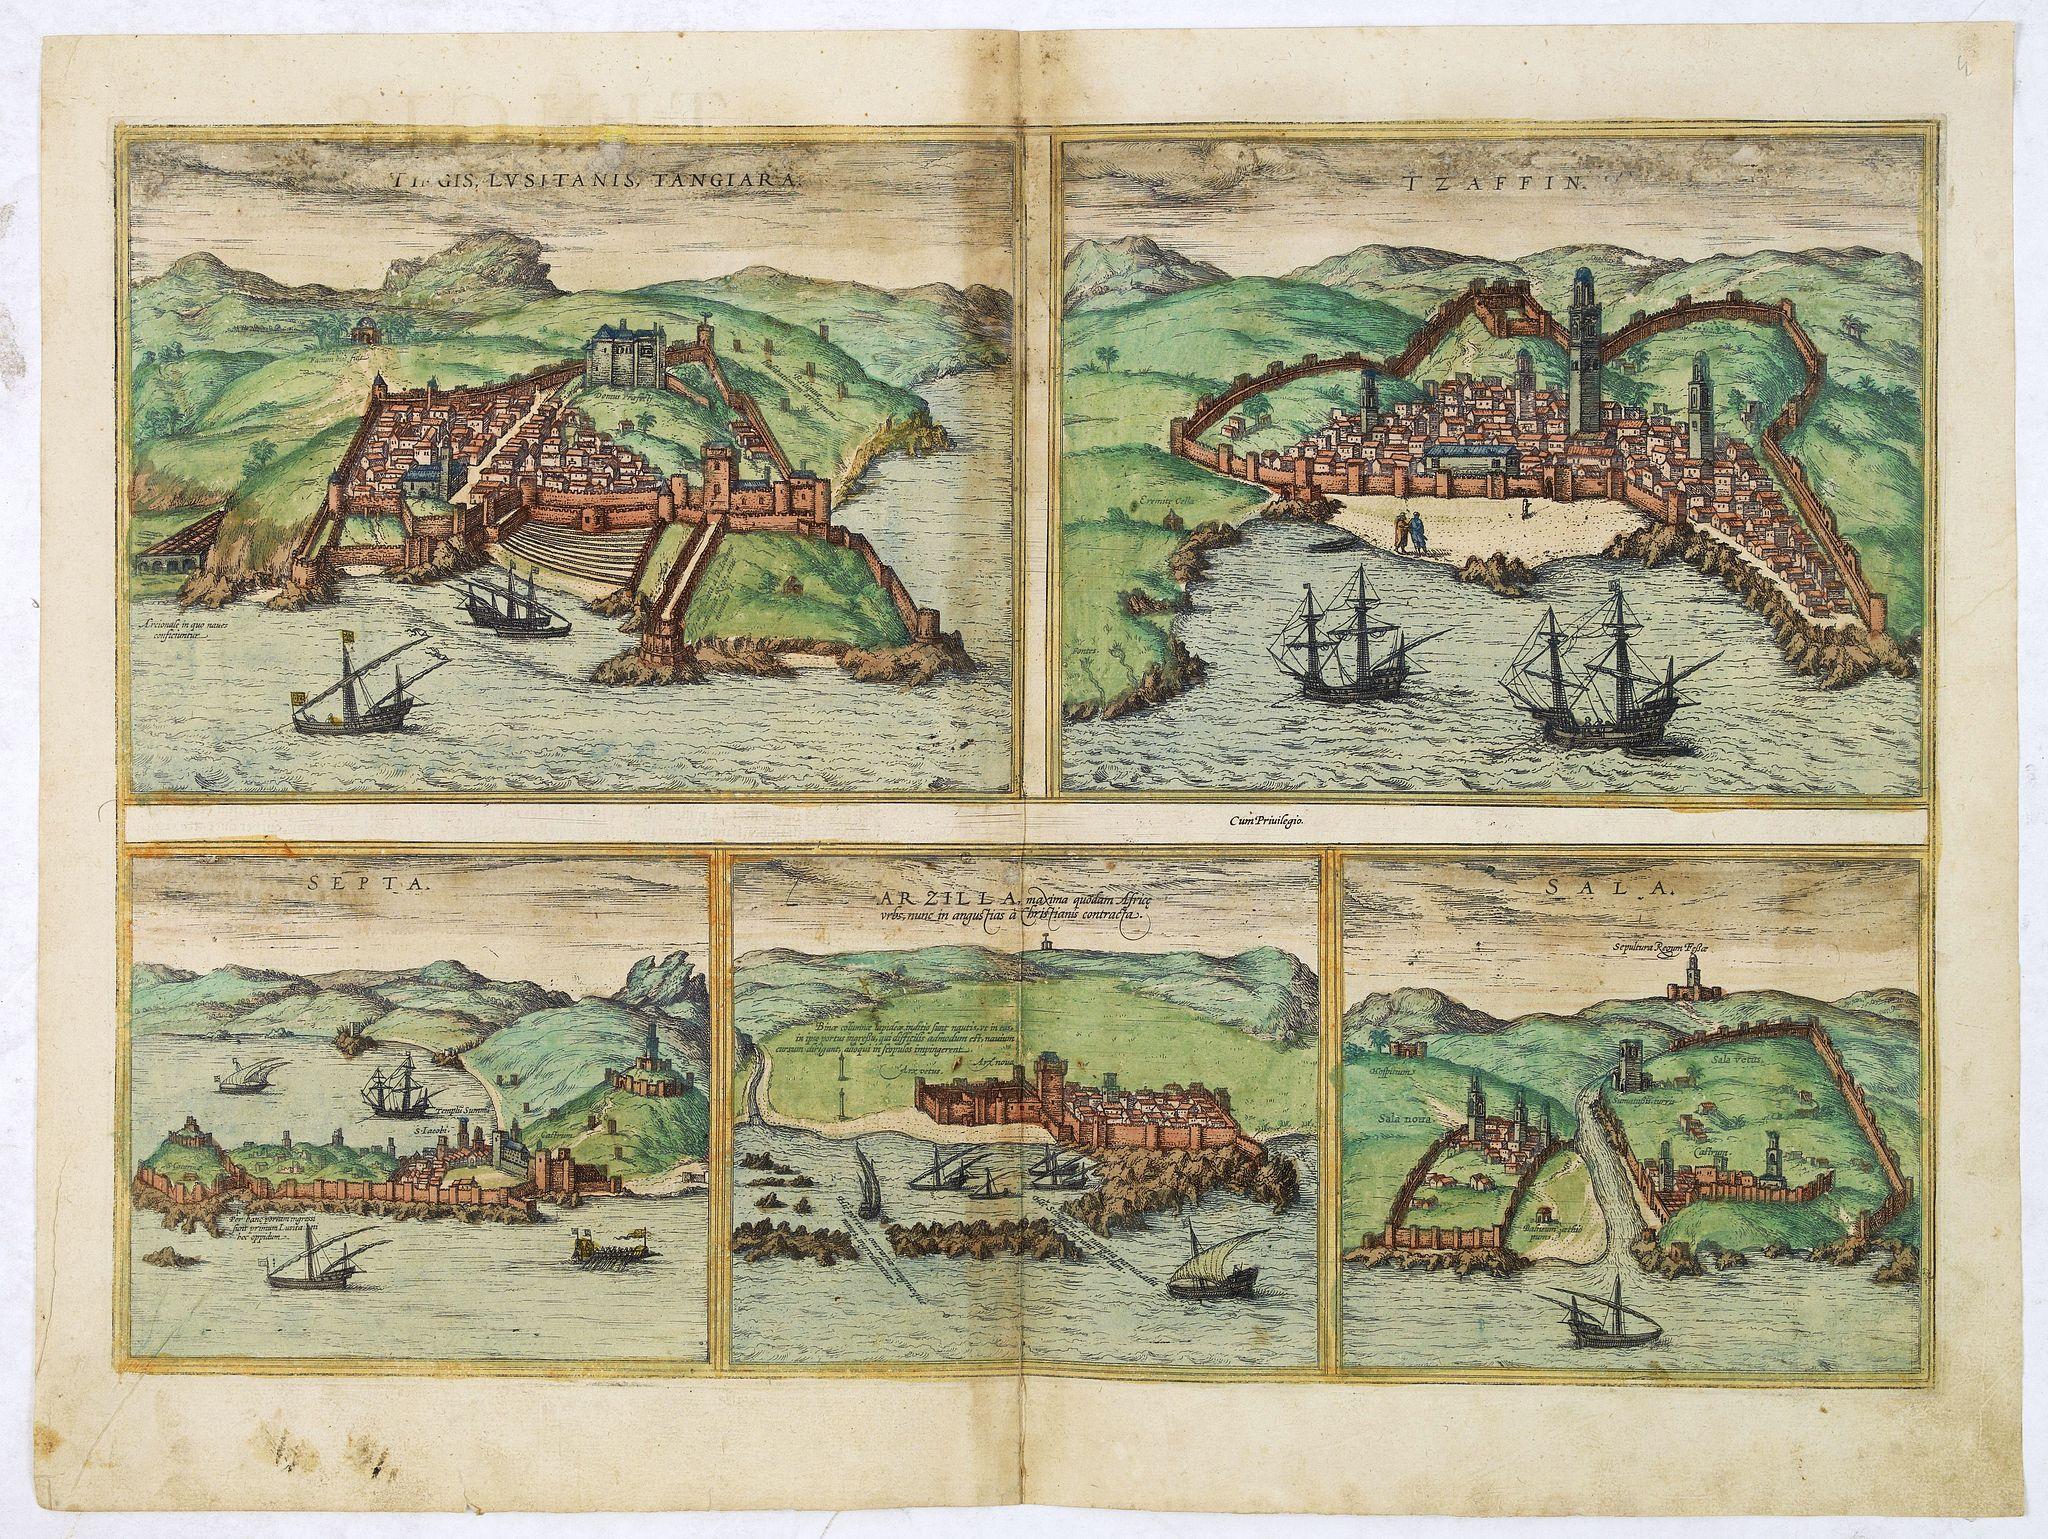 BRAUN,G. / HOGENBERG, F. -  Tingis Lusitanis Tangiara [on sheet with] Tzaffin [and] Septa [and] Arzilla [and] Sala.